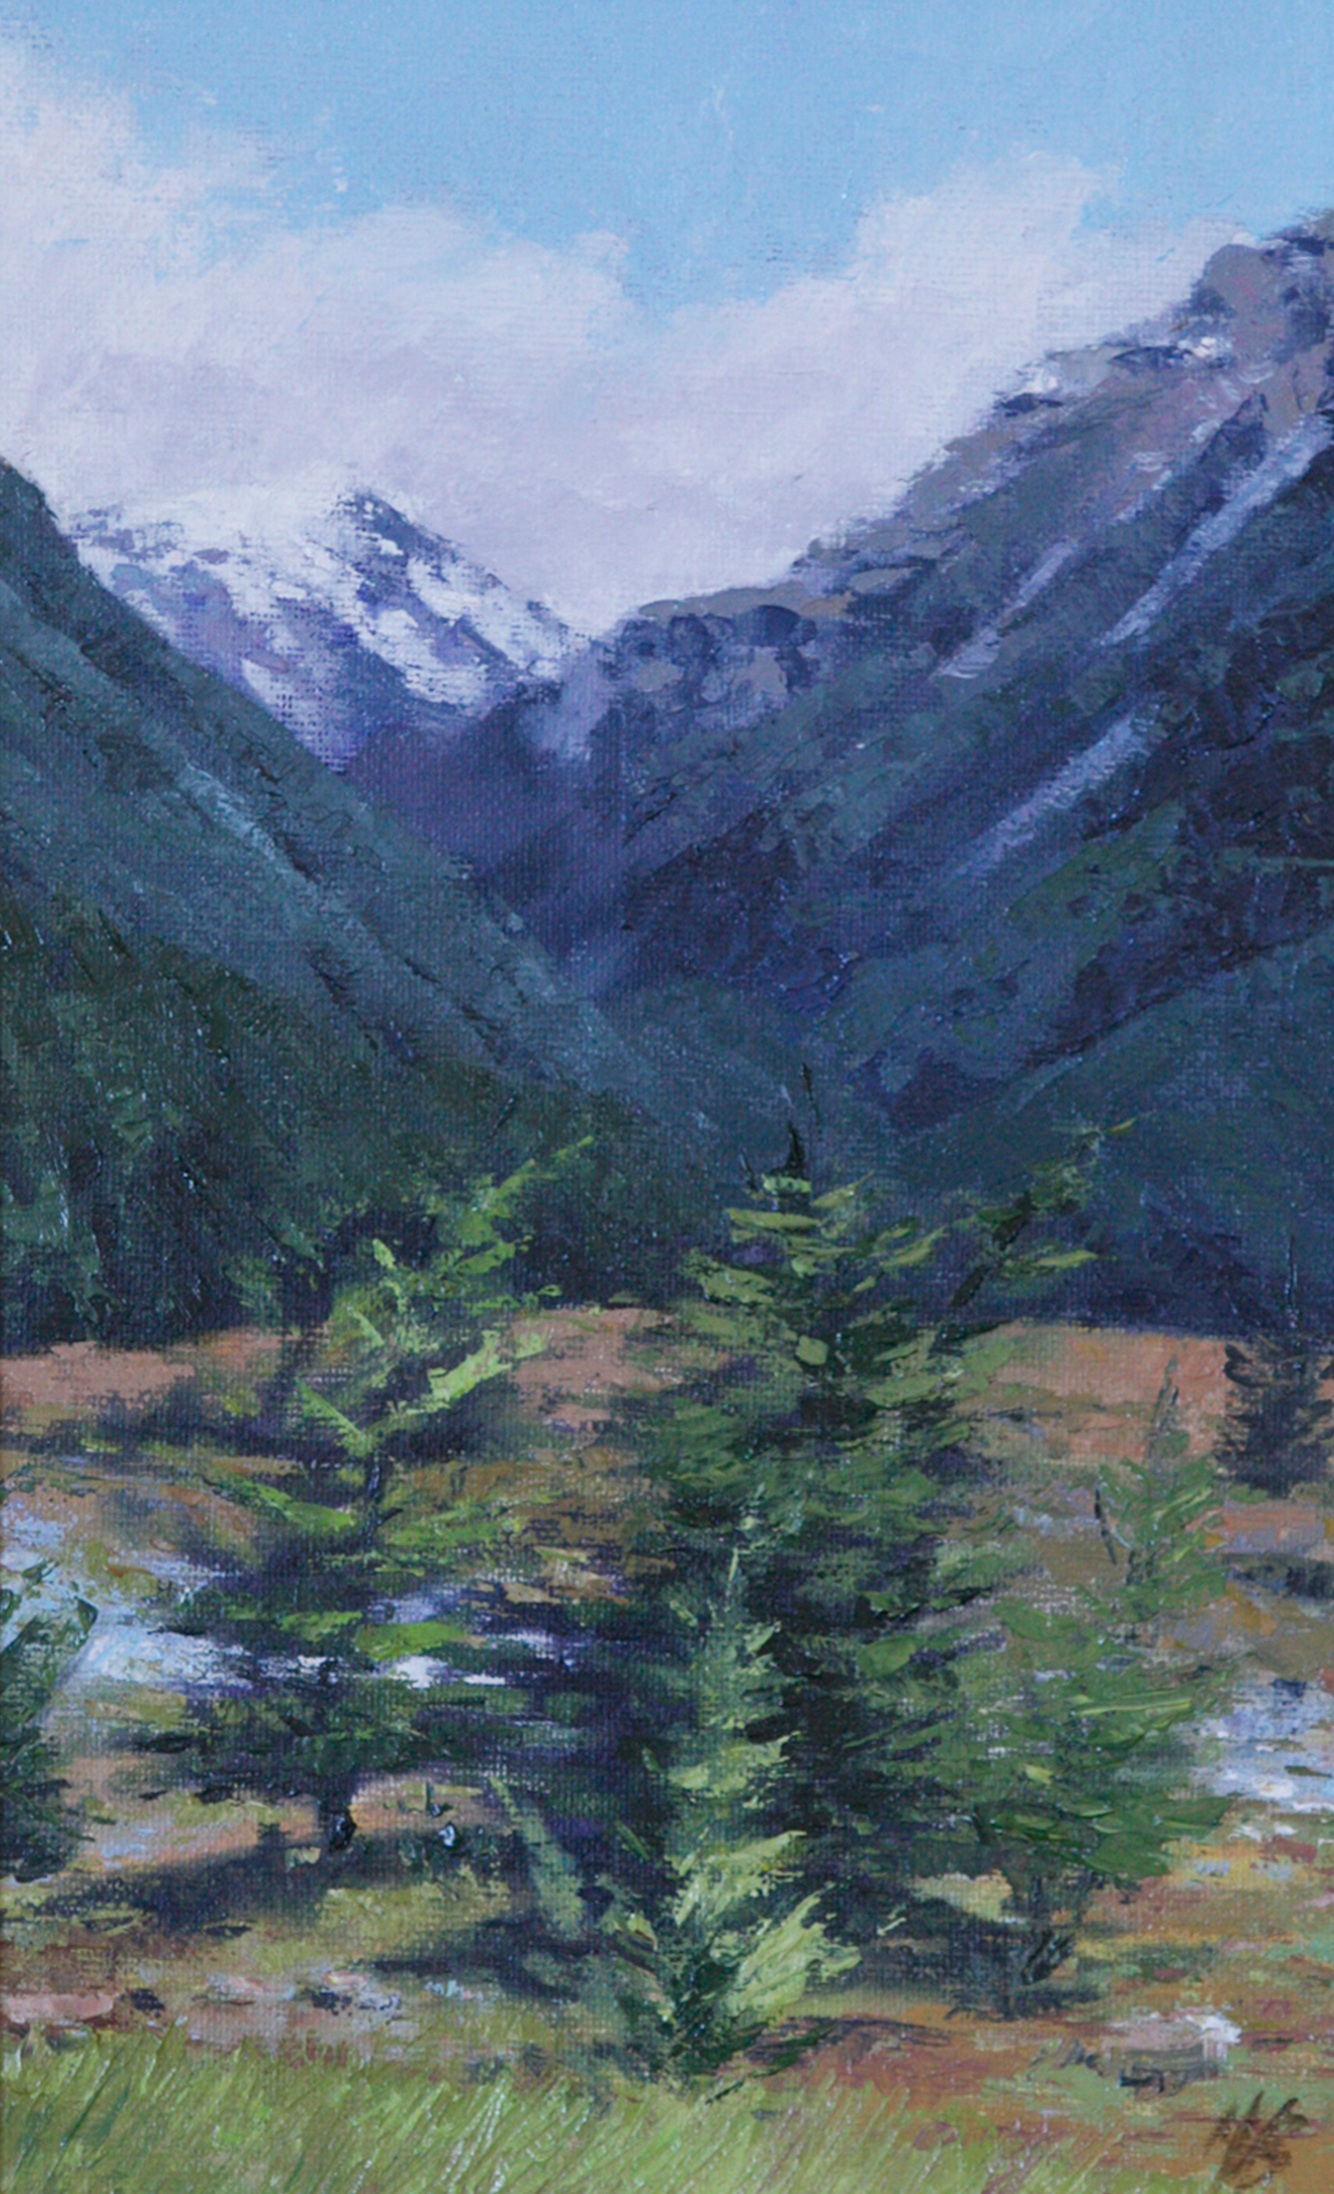 Beauty of the Alps (New Zealand), Oil, Framed, 36 x 48cm,  $600